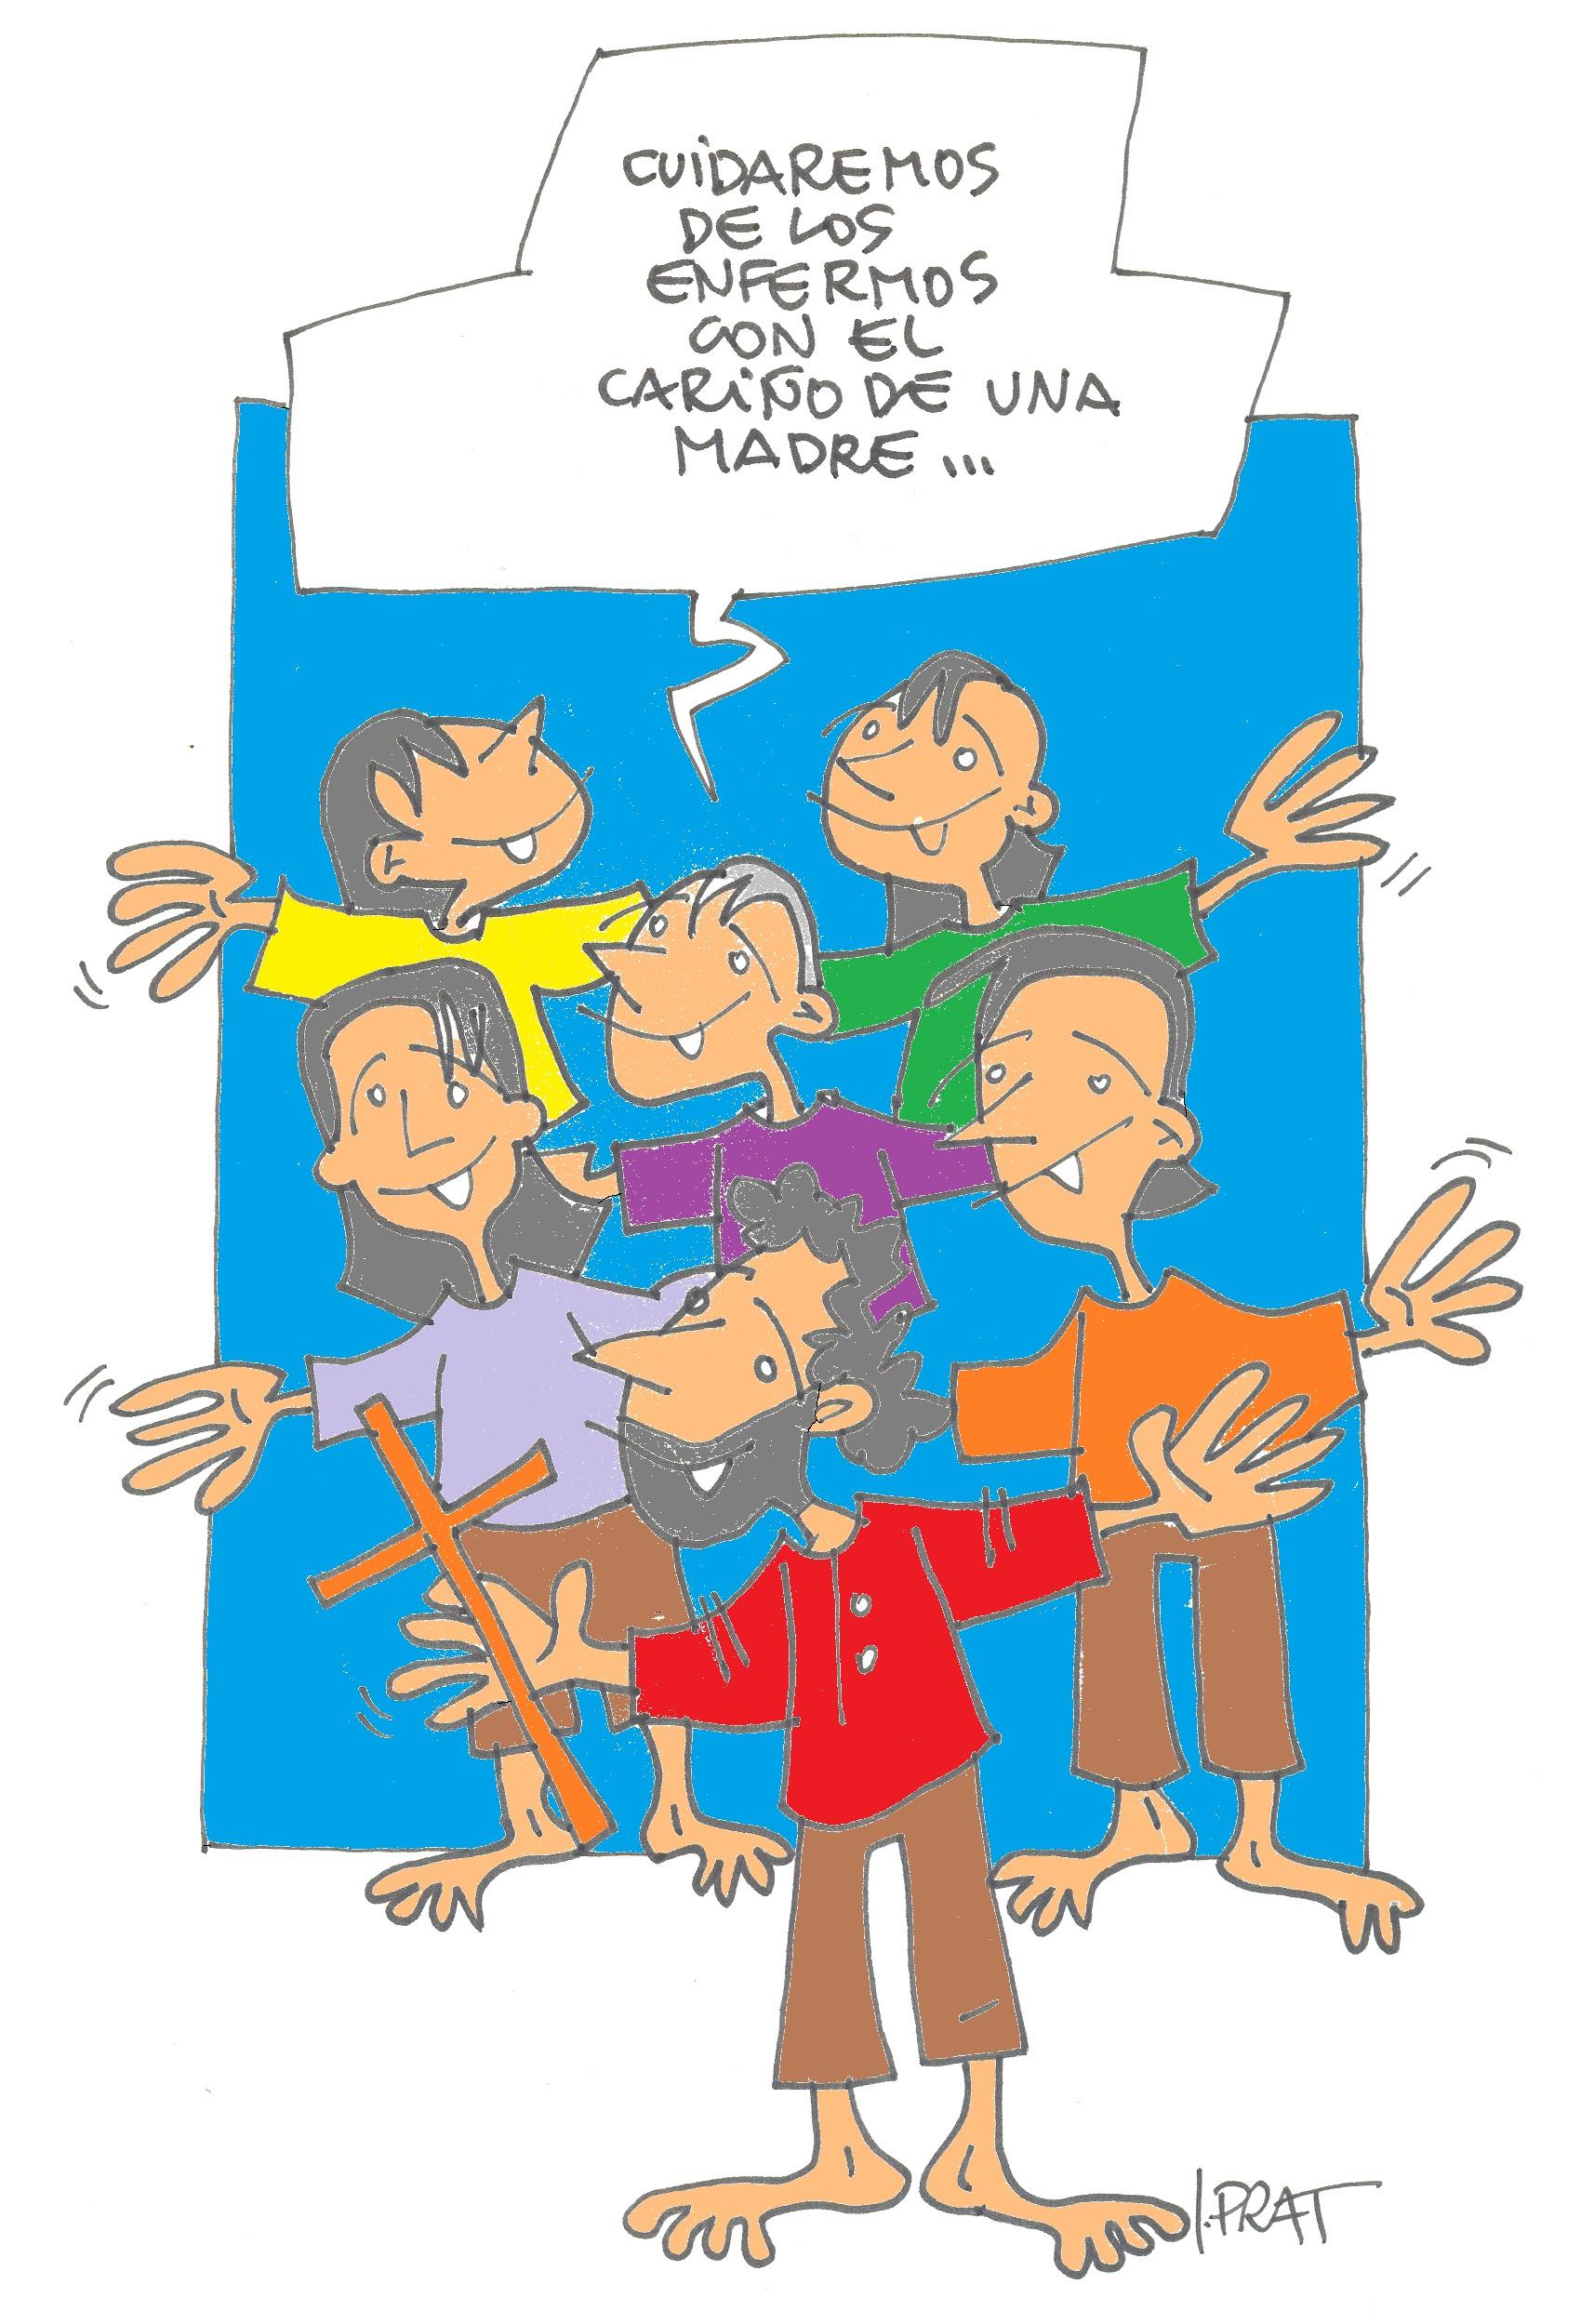 Ilustraciones biografia camilo jprat_Página_11